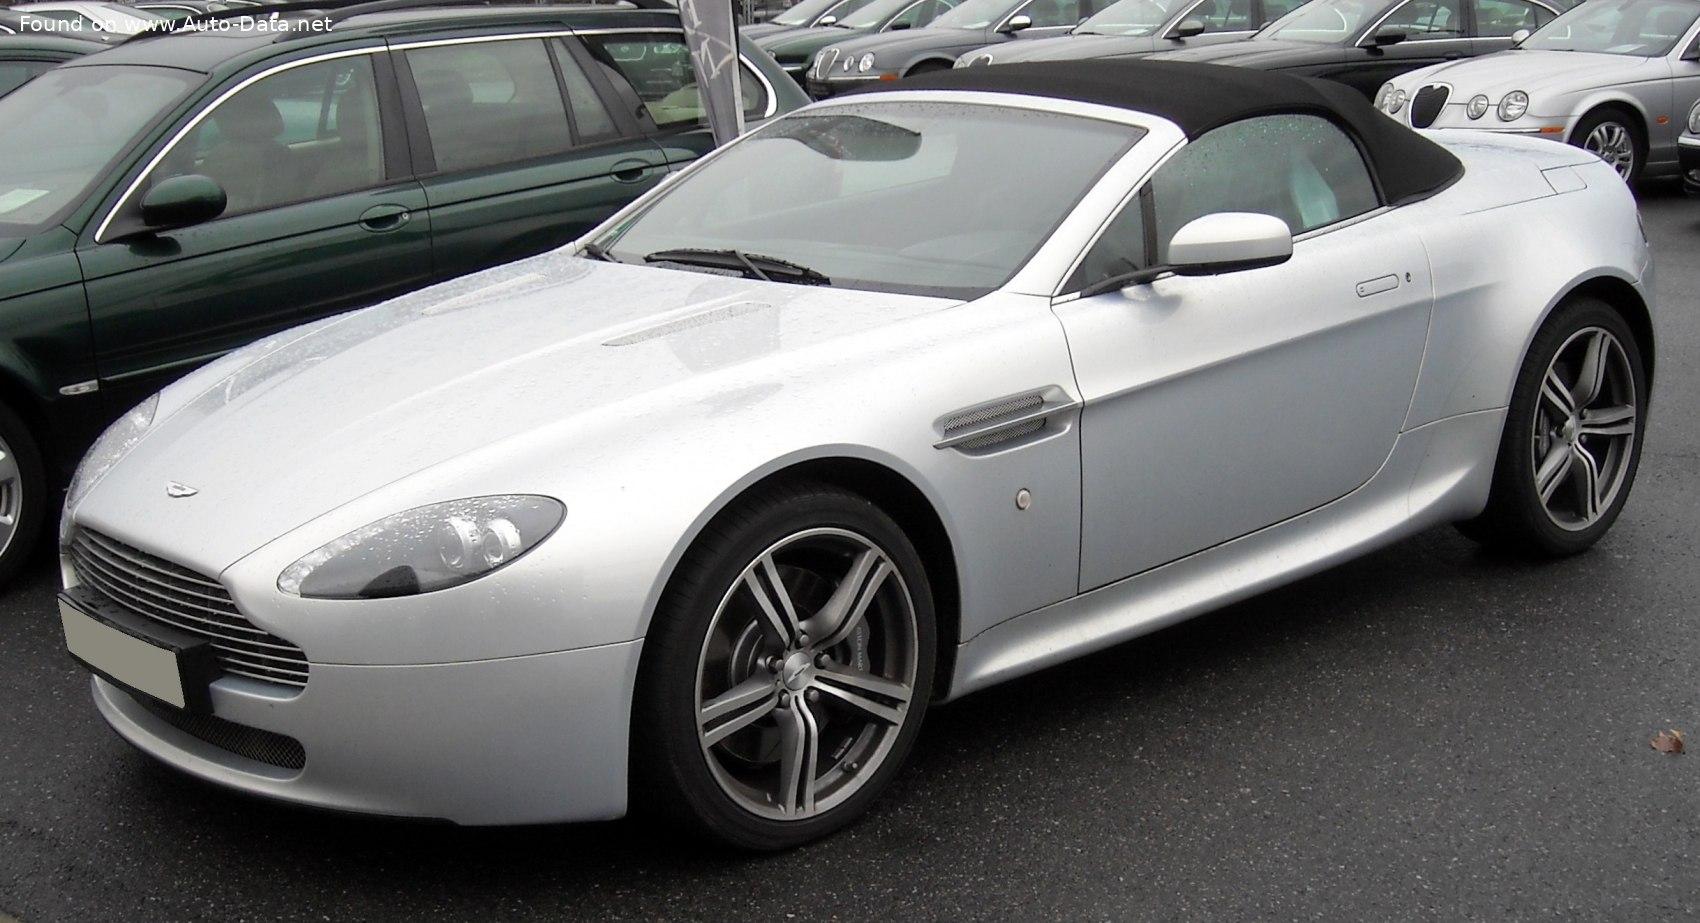 2006 Aston Martin V8 Vantage Roadster 2005 Technische Daten Verbrauch Maße